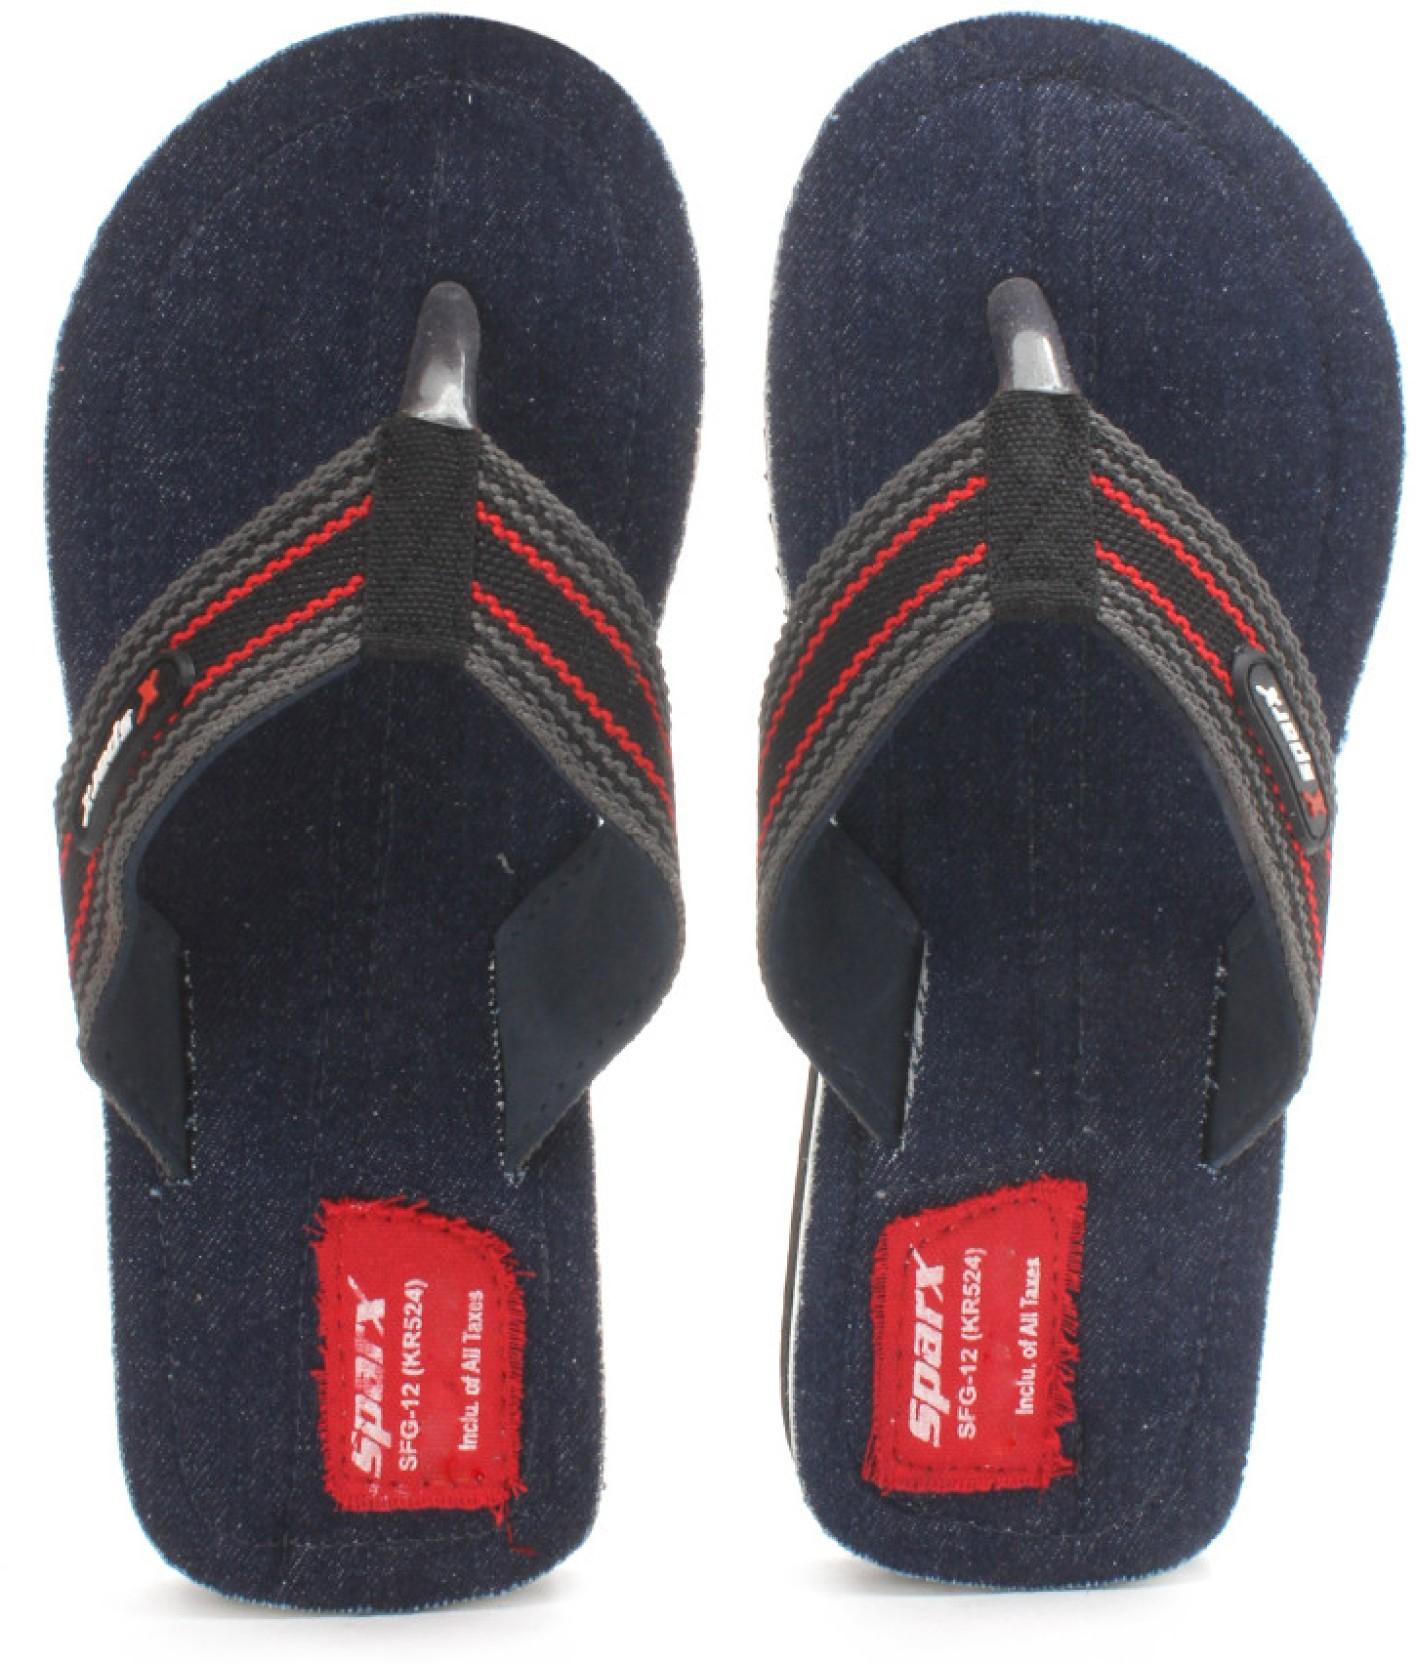 c4b7618871e5 Sparx SFG-12 Slippers - Buy Denim Color Sparx SFG-12 Slippers Online ...